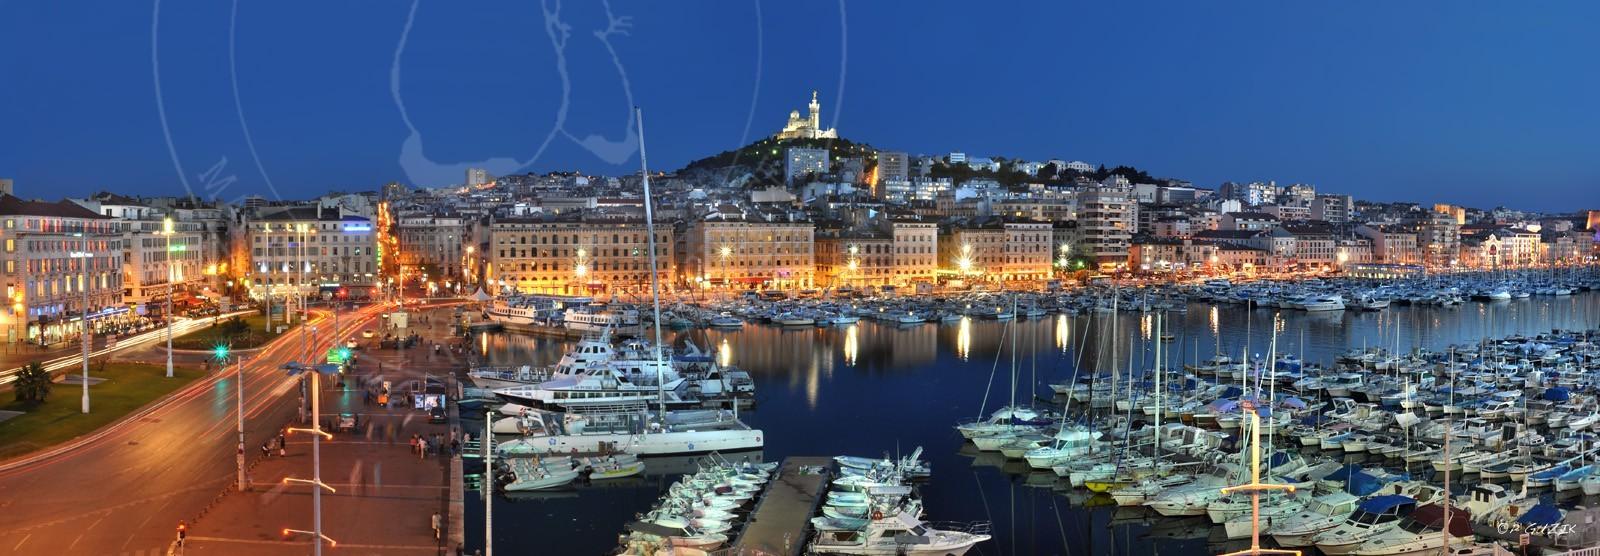 Ref 150 88 vieux port marseille de mimi 150x52 nuit - Taxi from marseille airport to vieux port ...